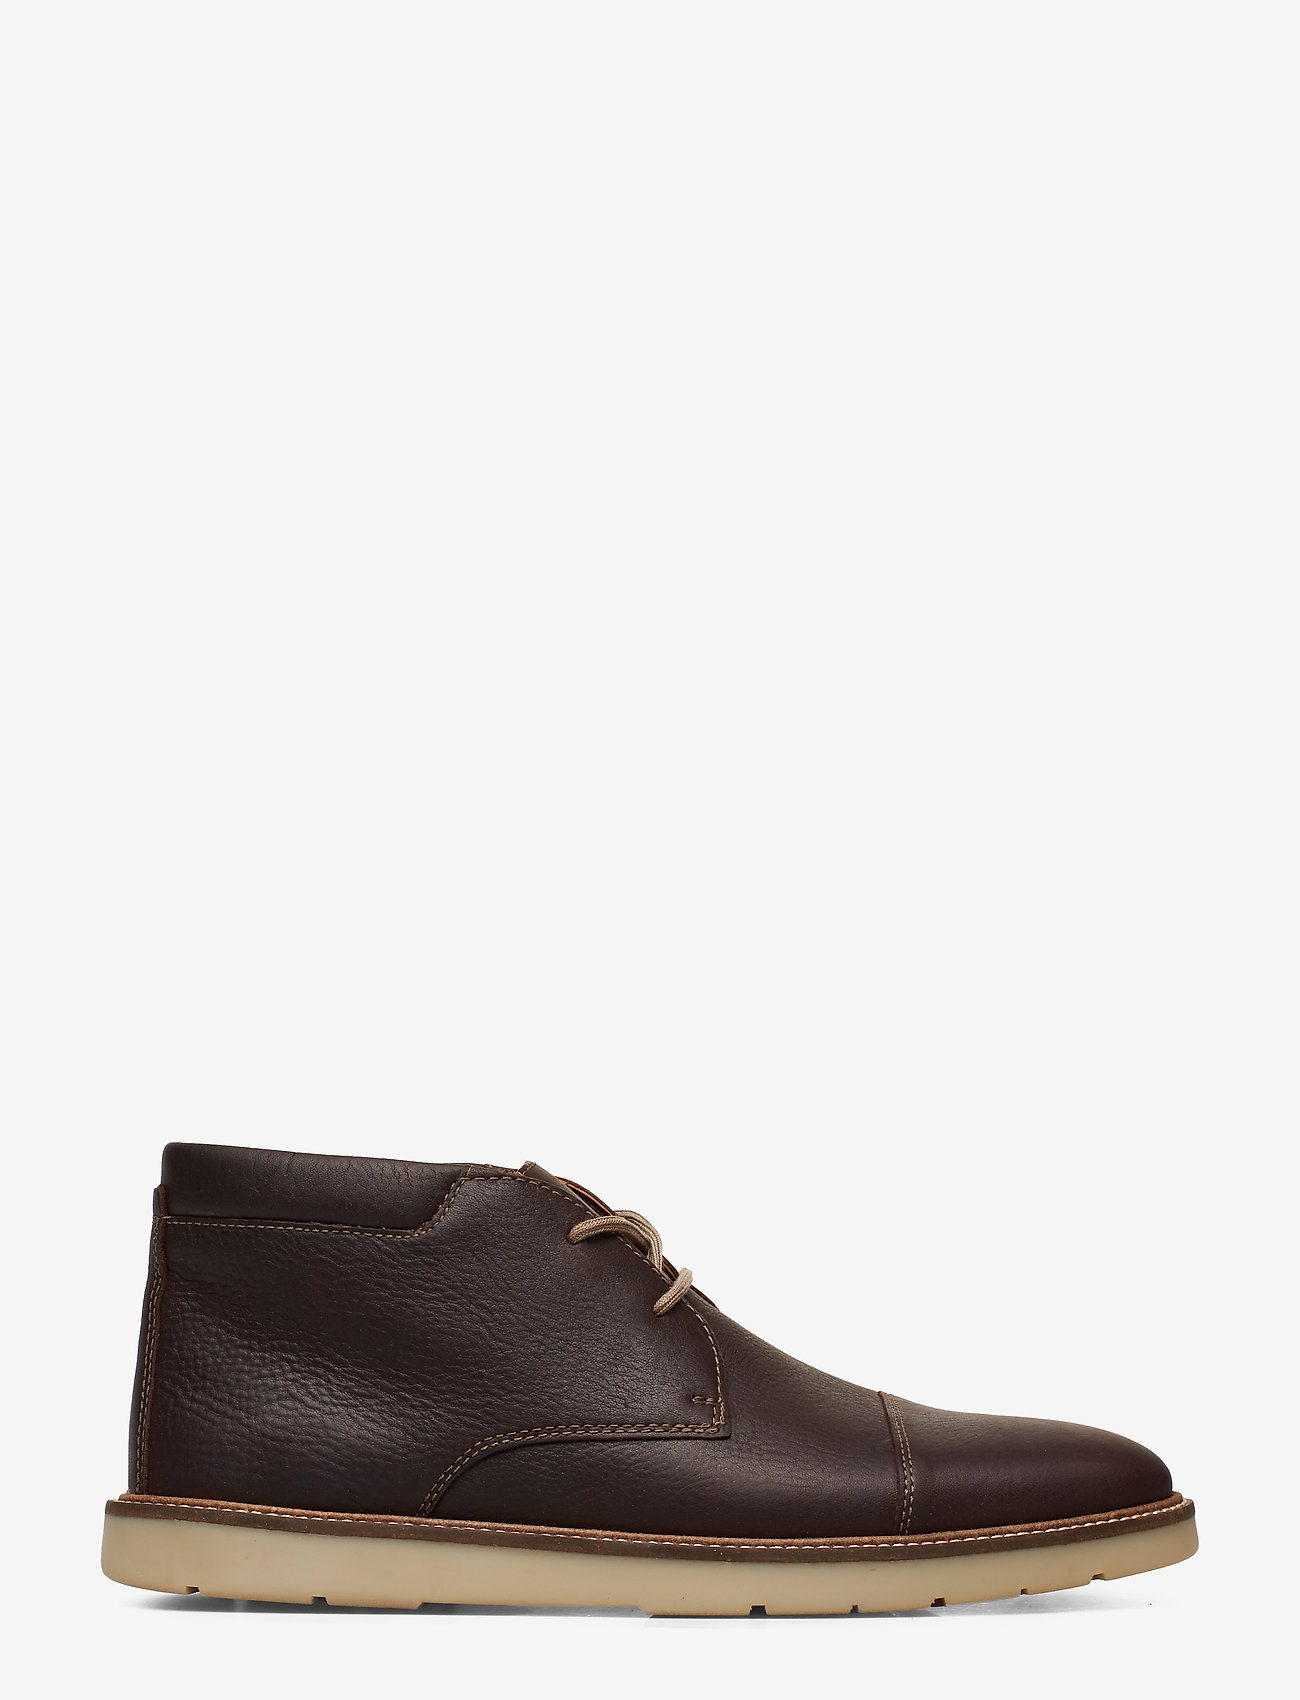 Clarks - Grandin Top - desert boots - dark brn tumbled - 1